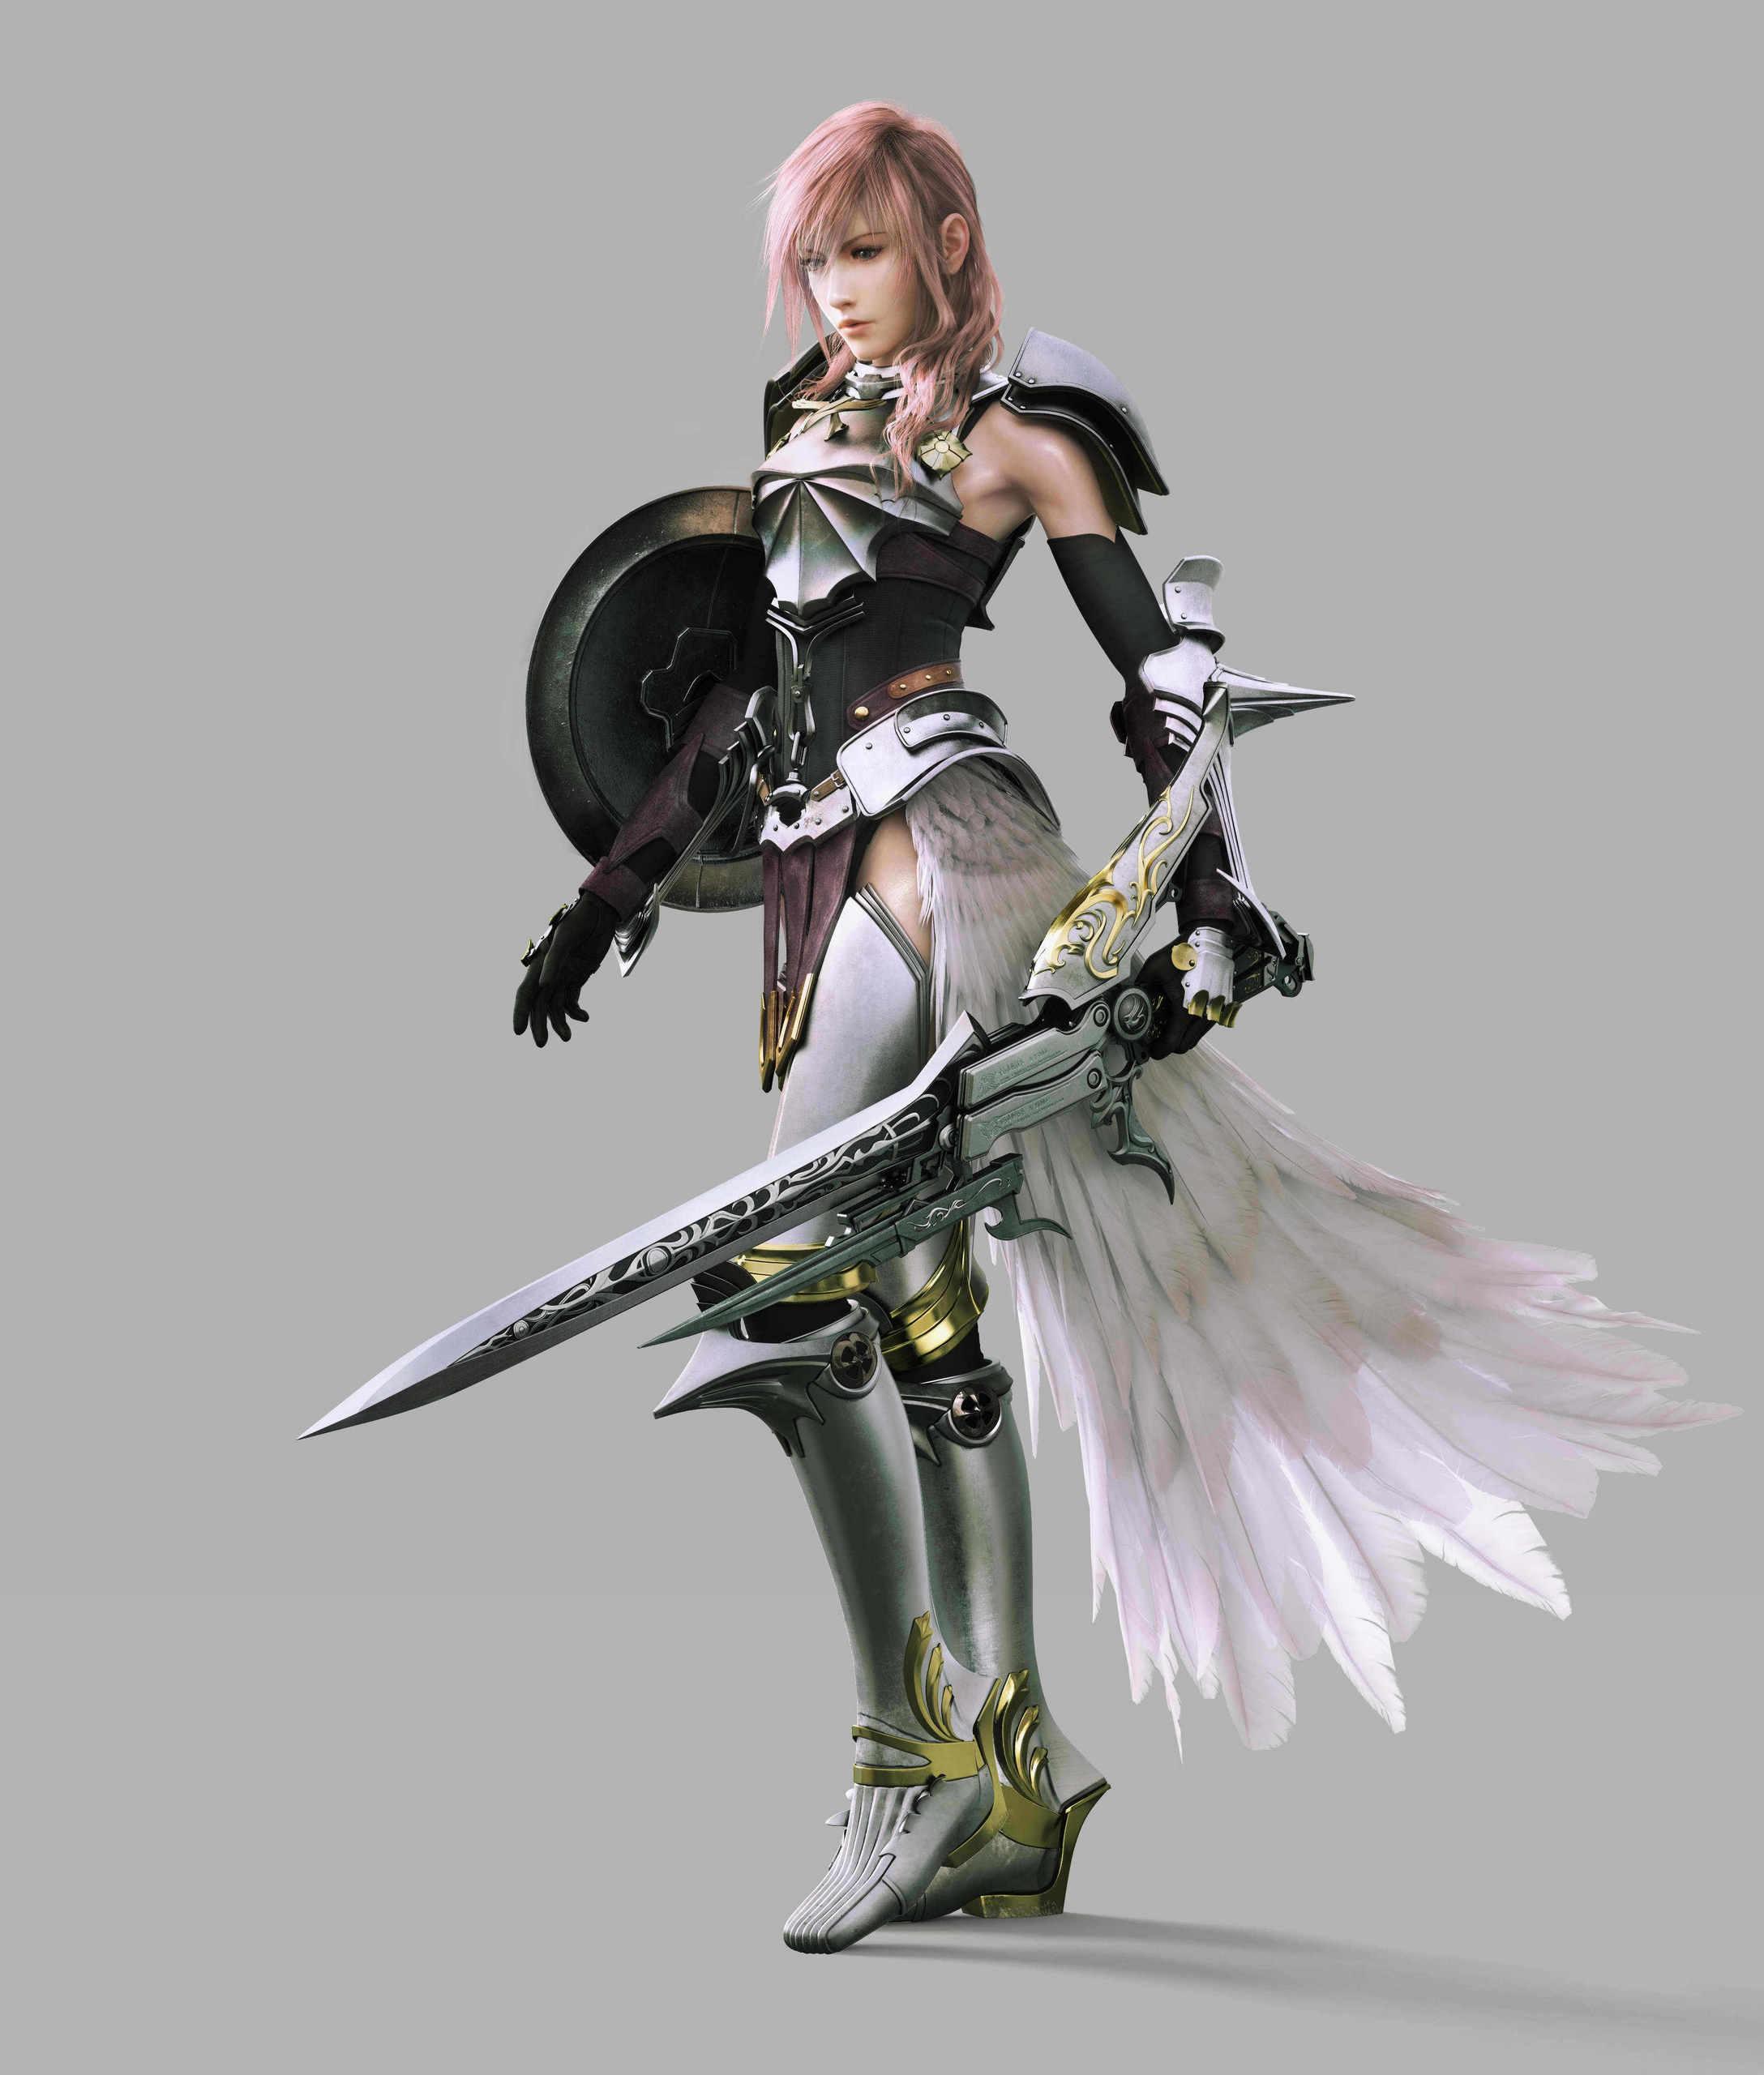 Fang Wallpaper   Final Fantasy XIII   Pinterest